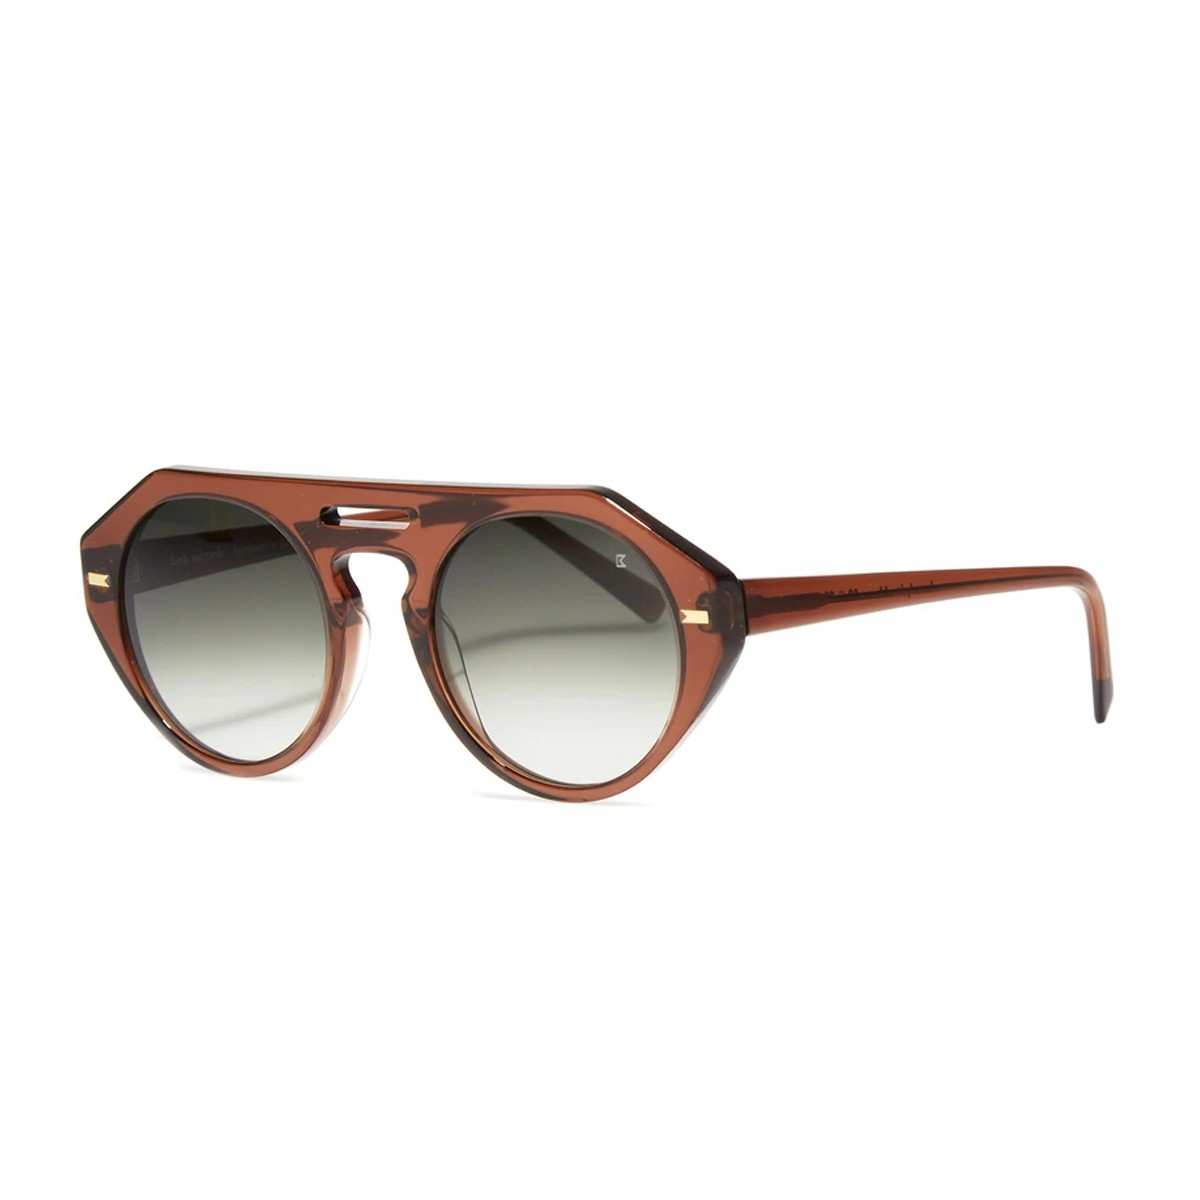 Bob Sdrunk Brandy/S | Unisex sunglasses